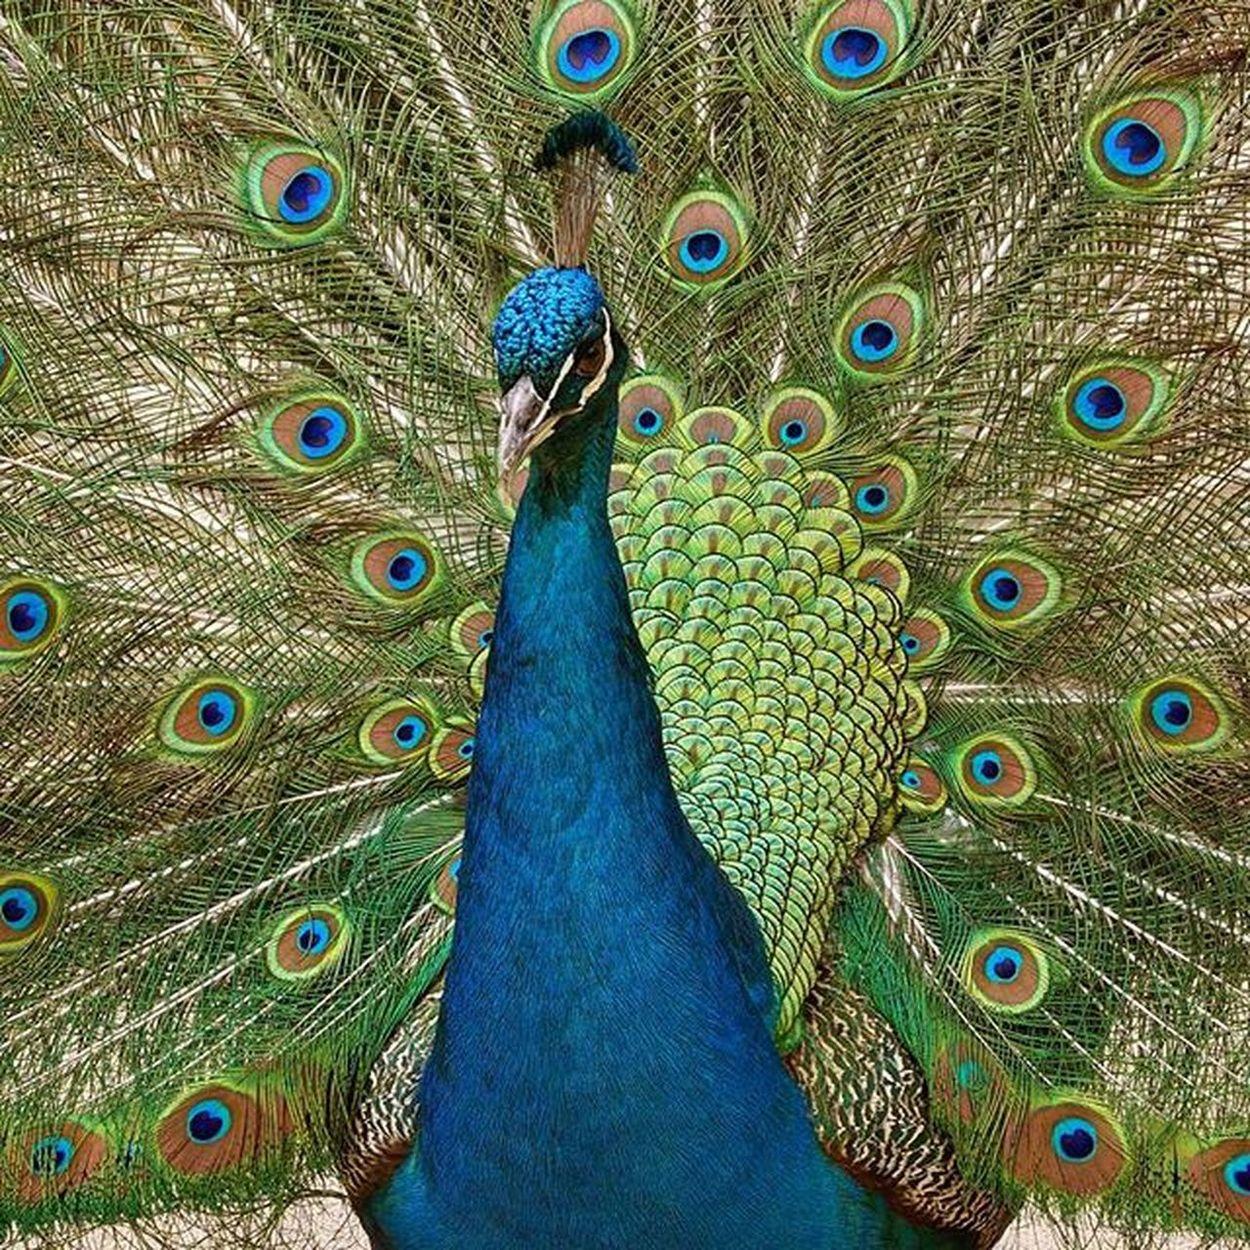 This Peacock at Blackbutt was hypnotic Blackbuttreserve Blackbuttreservepark Nature Birds Newy Newyisok Igersnewy Newcastlensw Mynewcastle Newcastlelife Newcastlelifestyle Visitnewcastle